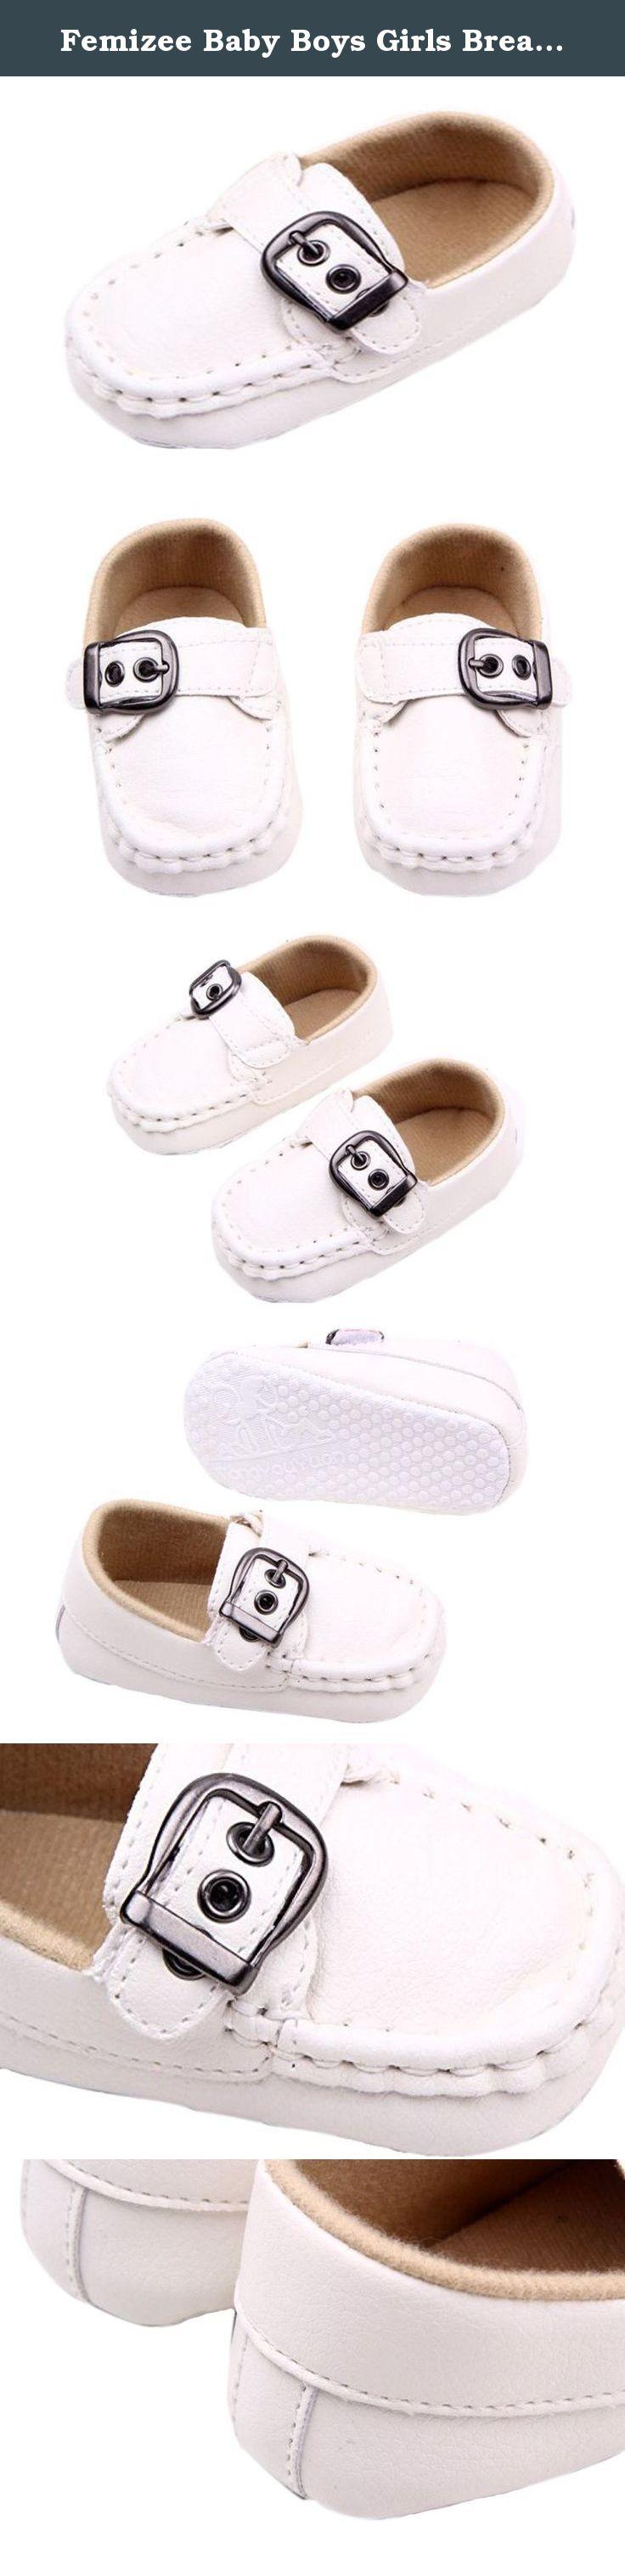 Femizee Baby Boys Girls Breathable Soft Sole Slip on Crib Shoes